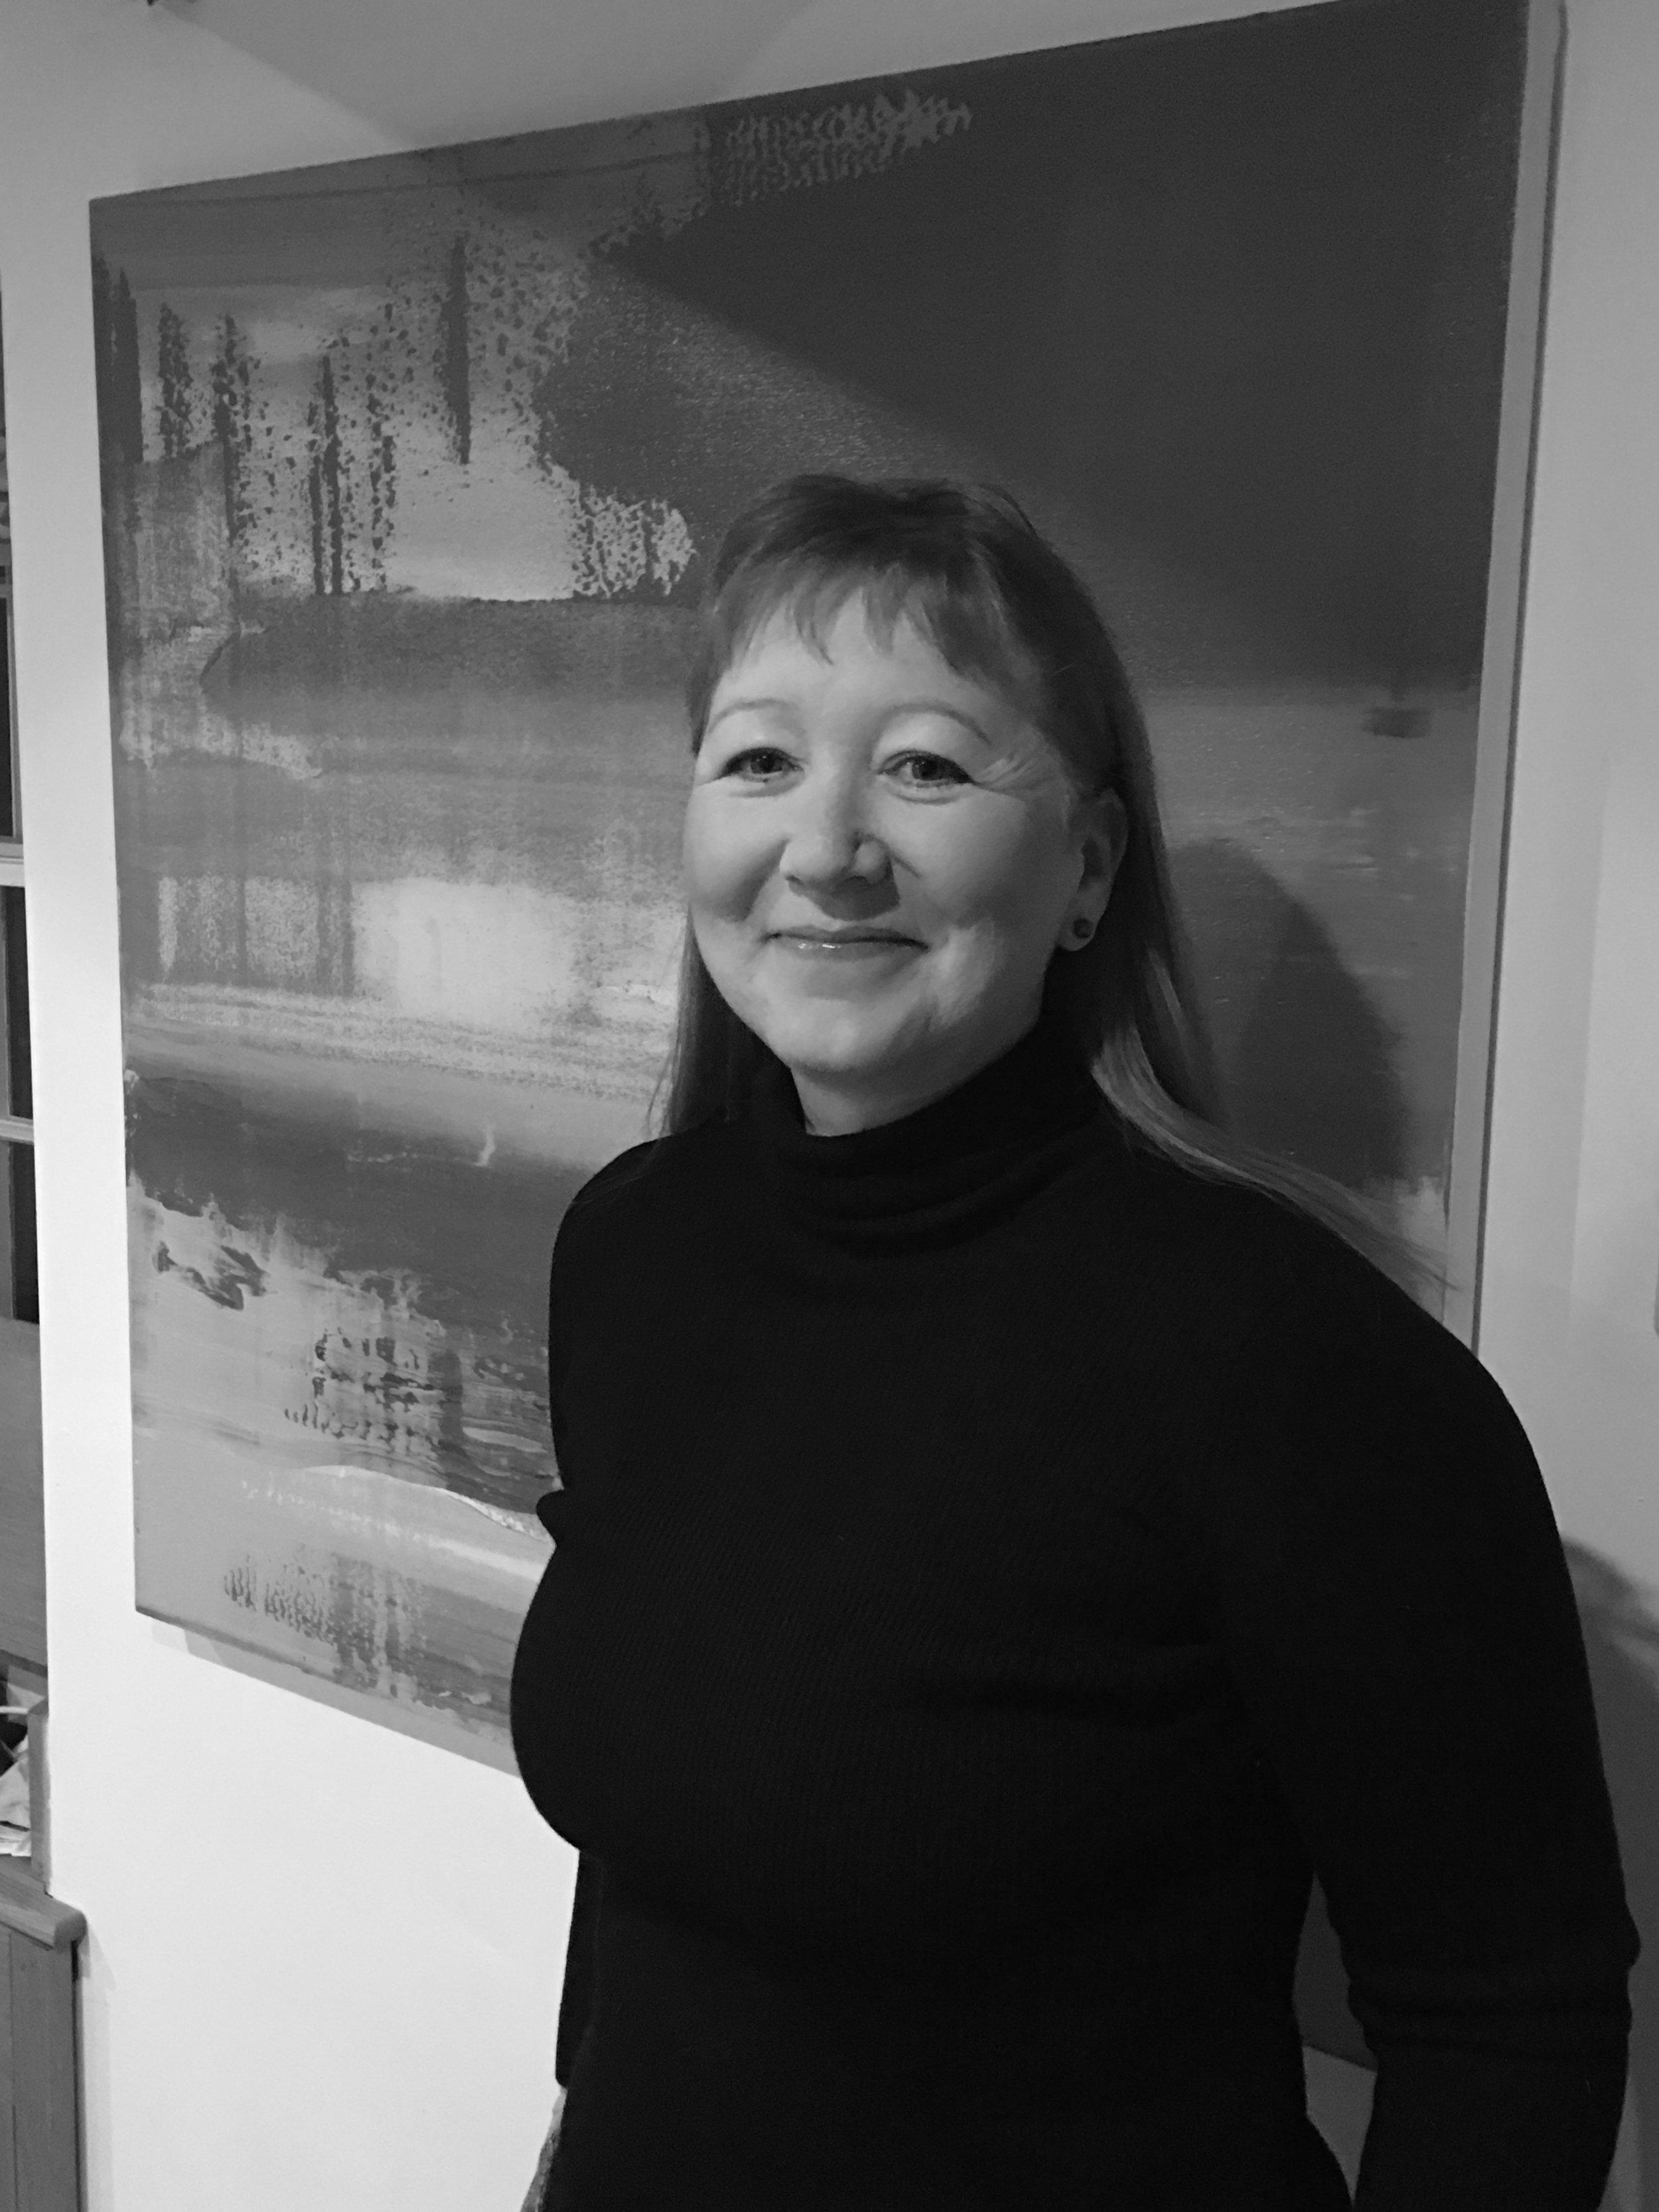 Patricia Graham, QI coach & Lead for Adult Mental Health Service NHS Lothian